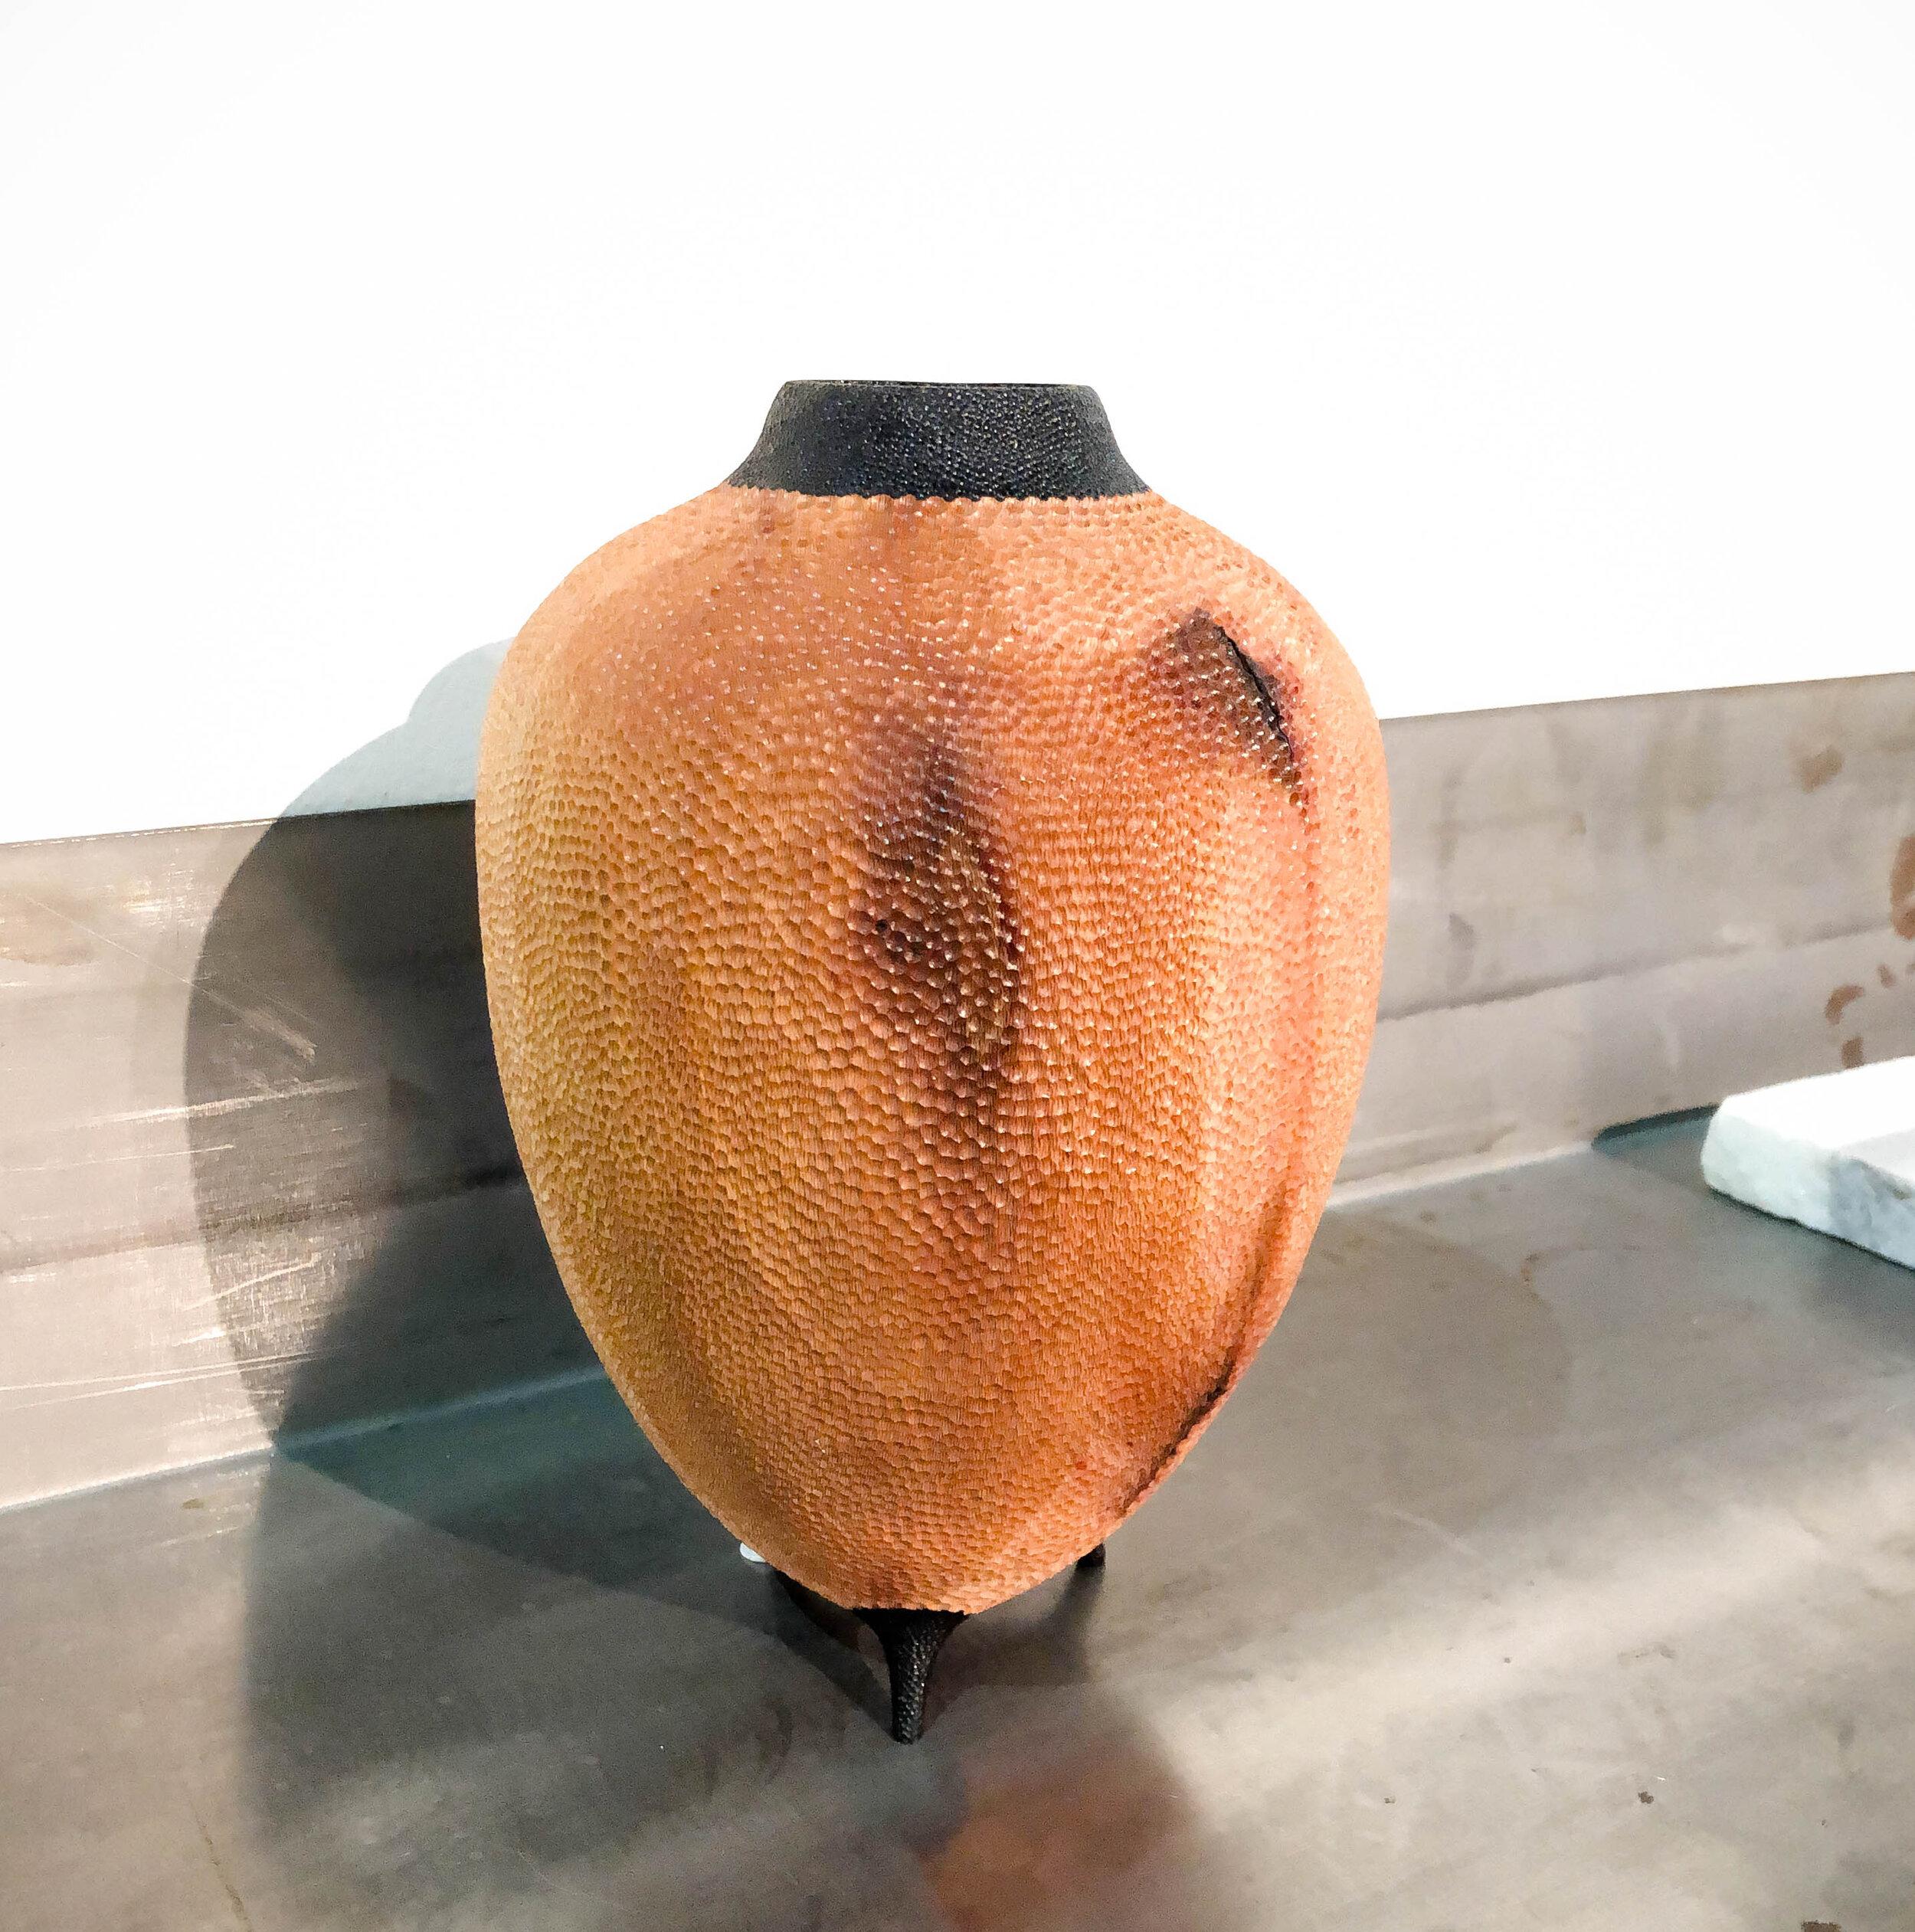 Heath Bateman  FACET-NATED, 2019  Wood (Sycamore)  Kennewick, WA